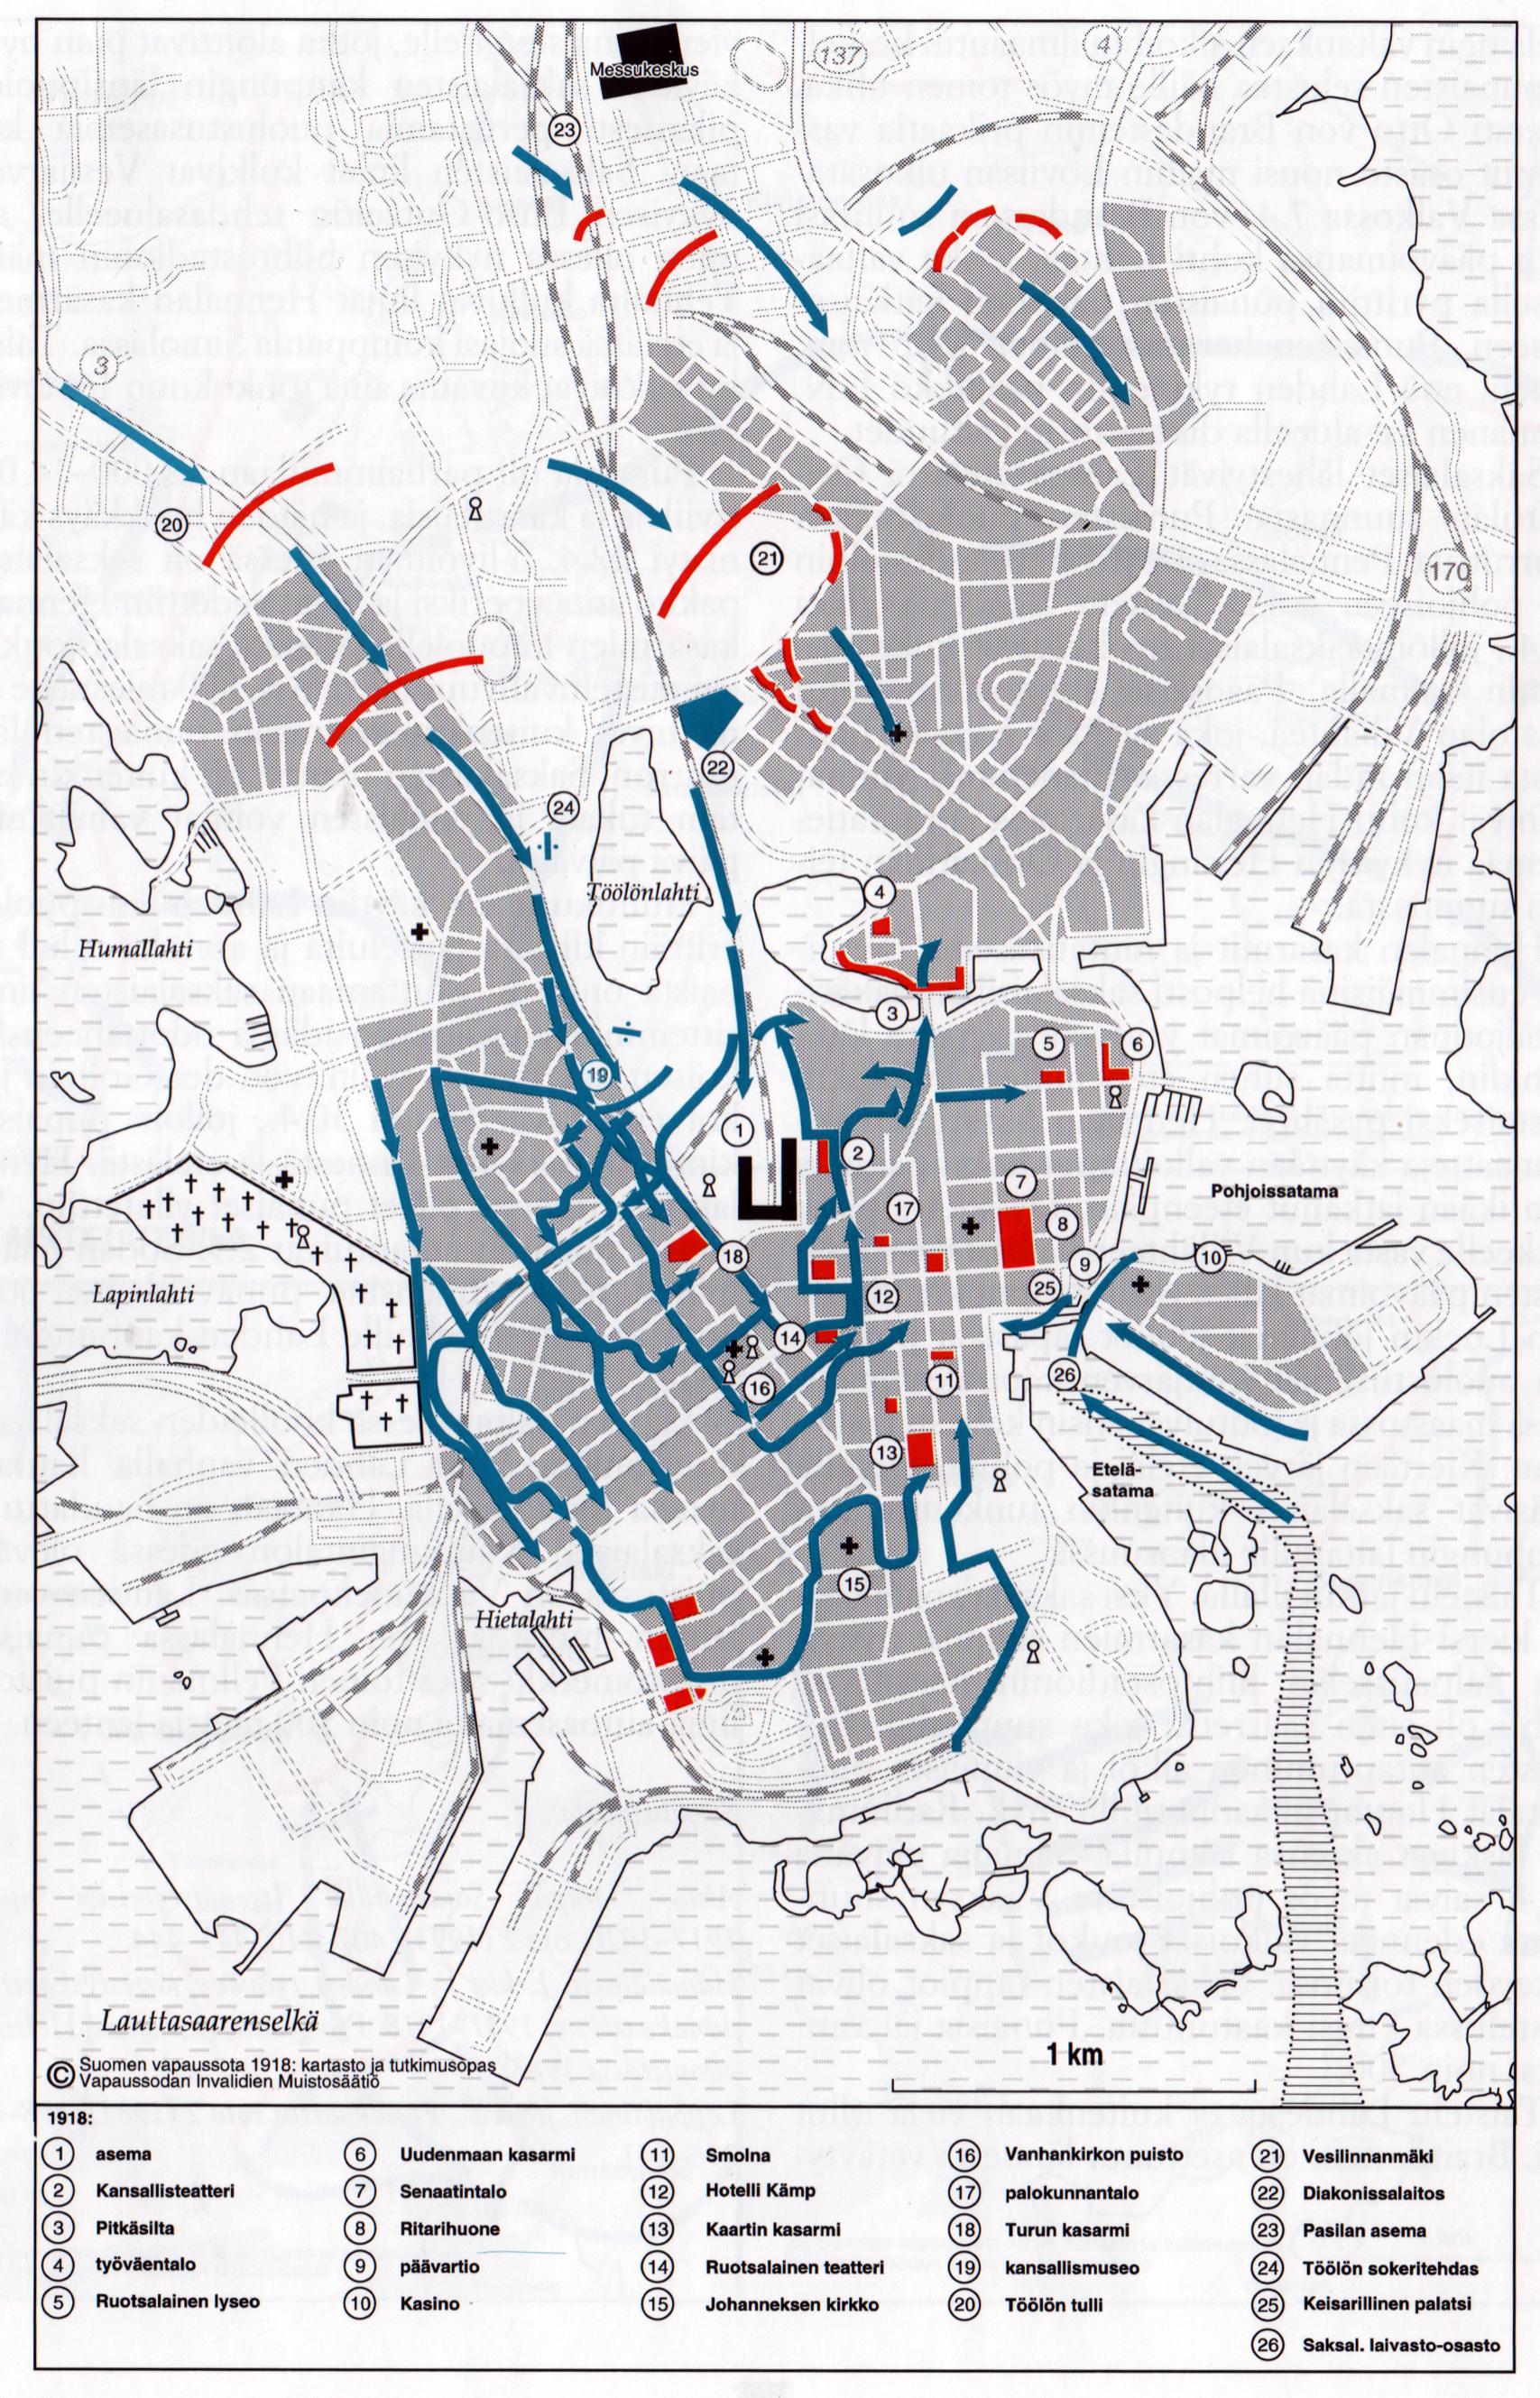 1918-vapaussodan-kartasto-helsinki-keskusta-demo